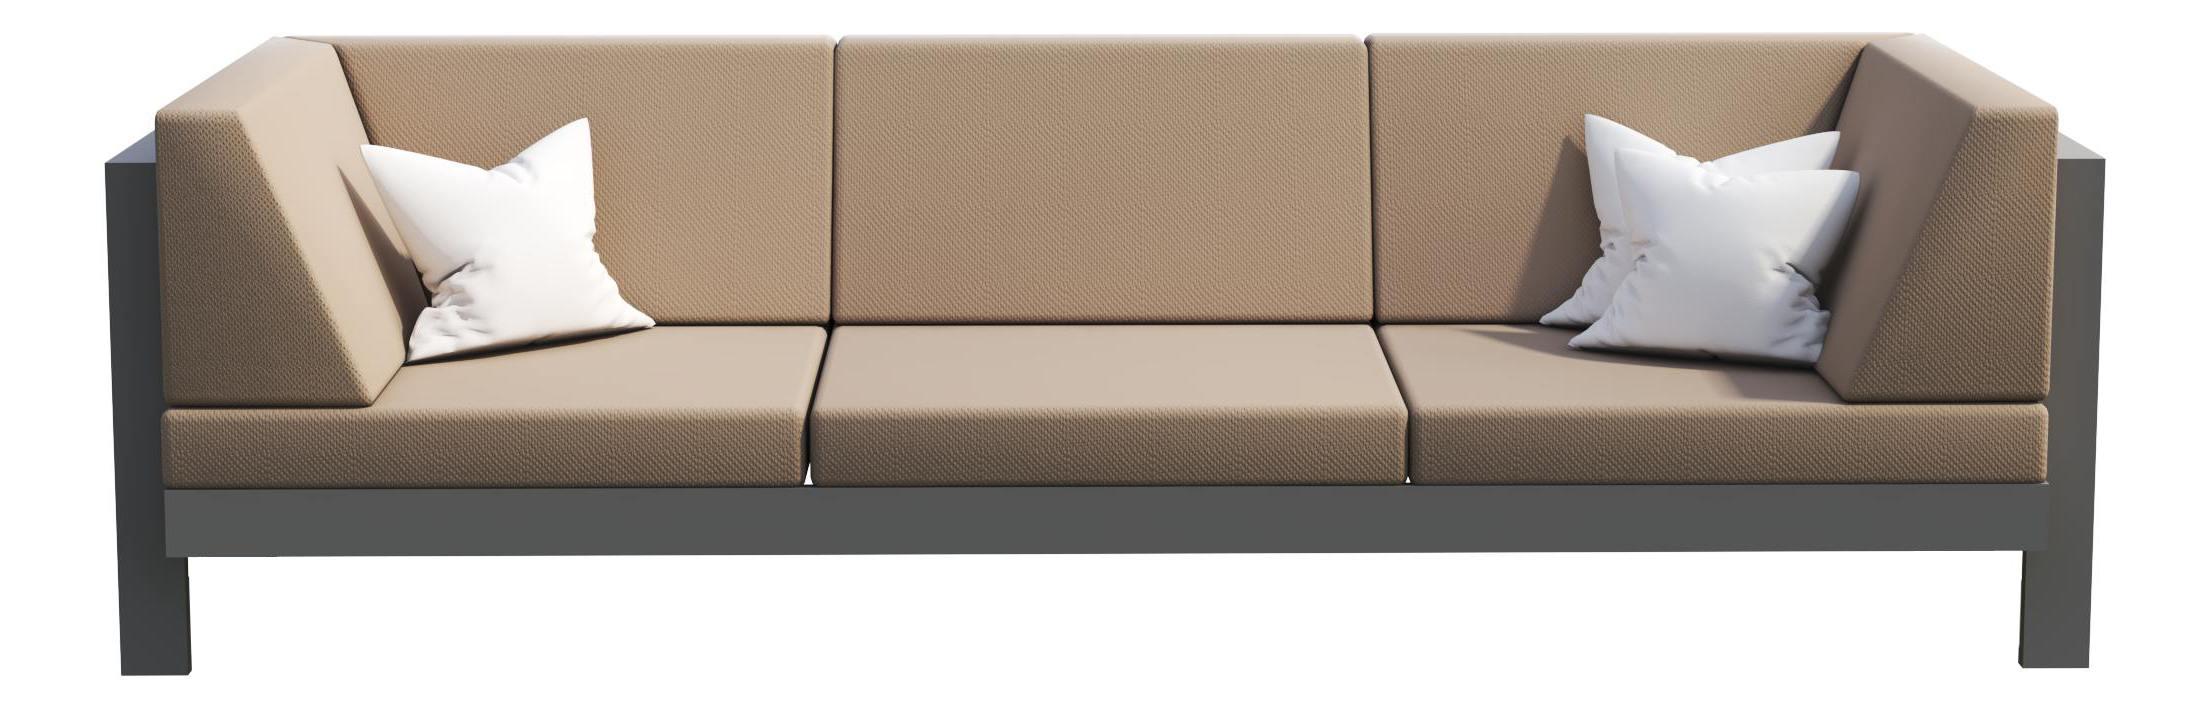 sofa 3osobowa ambasador